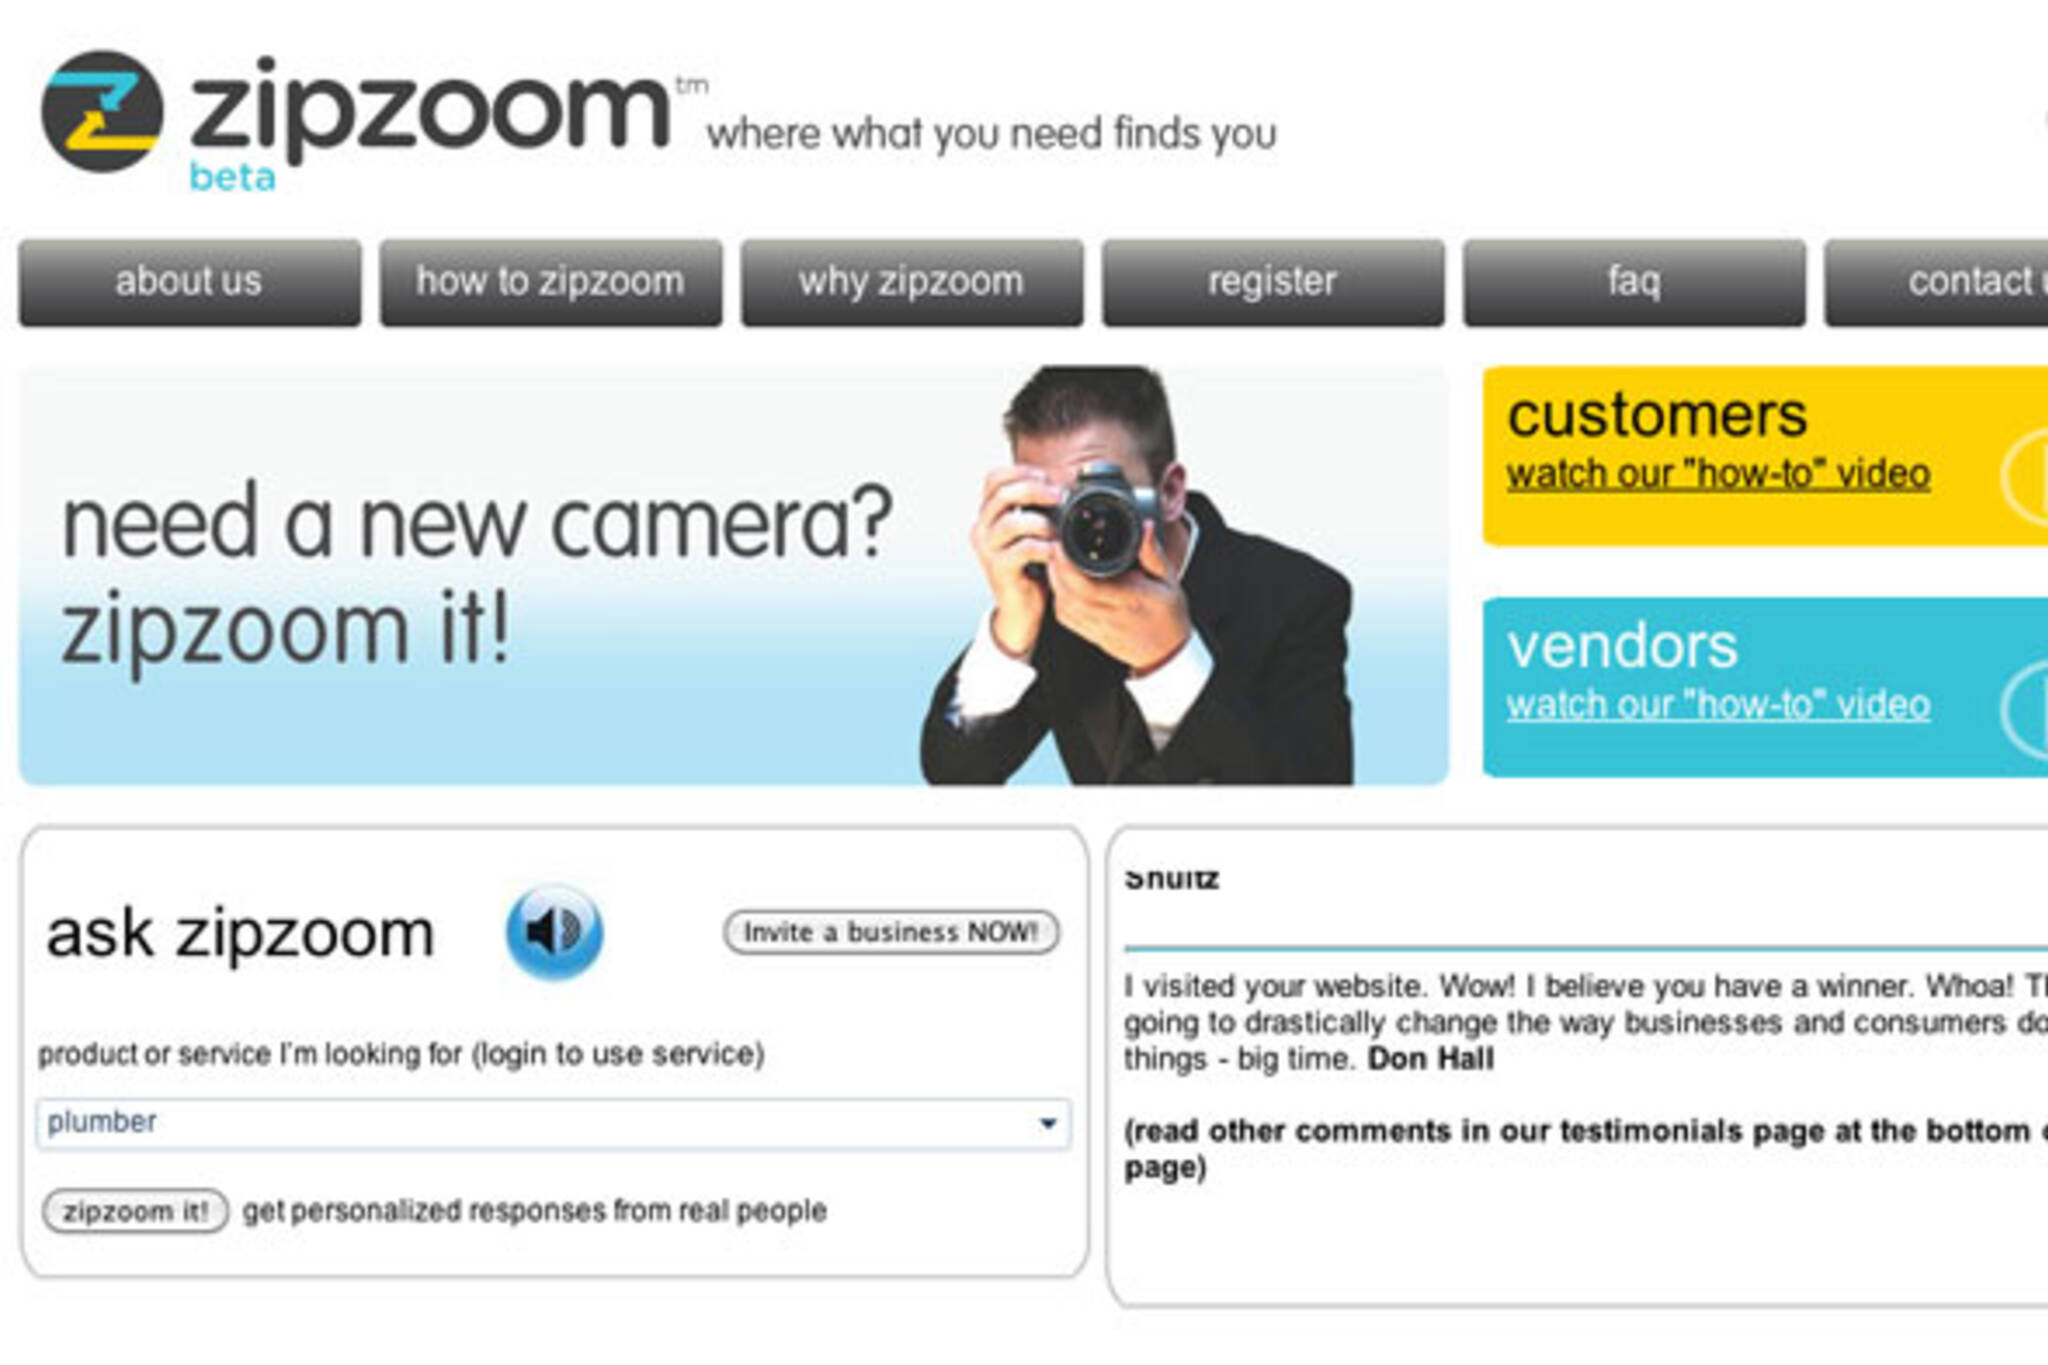 Zipzoom